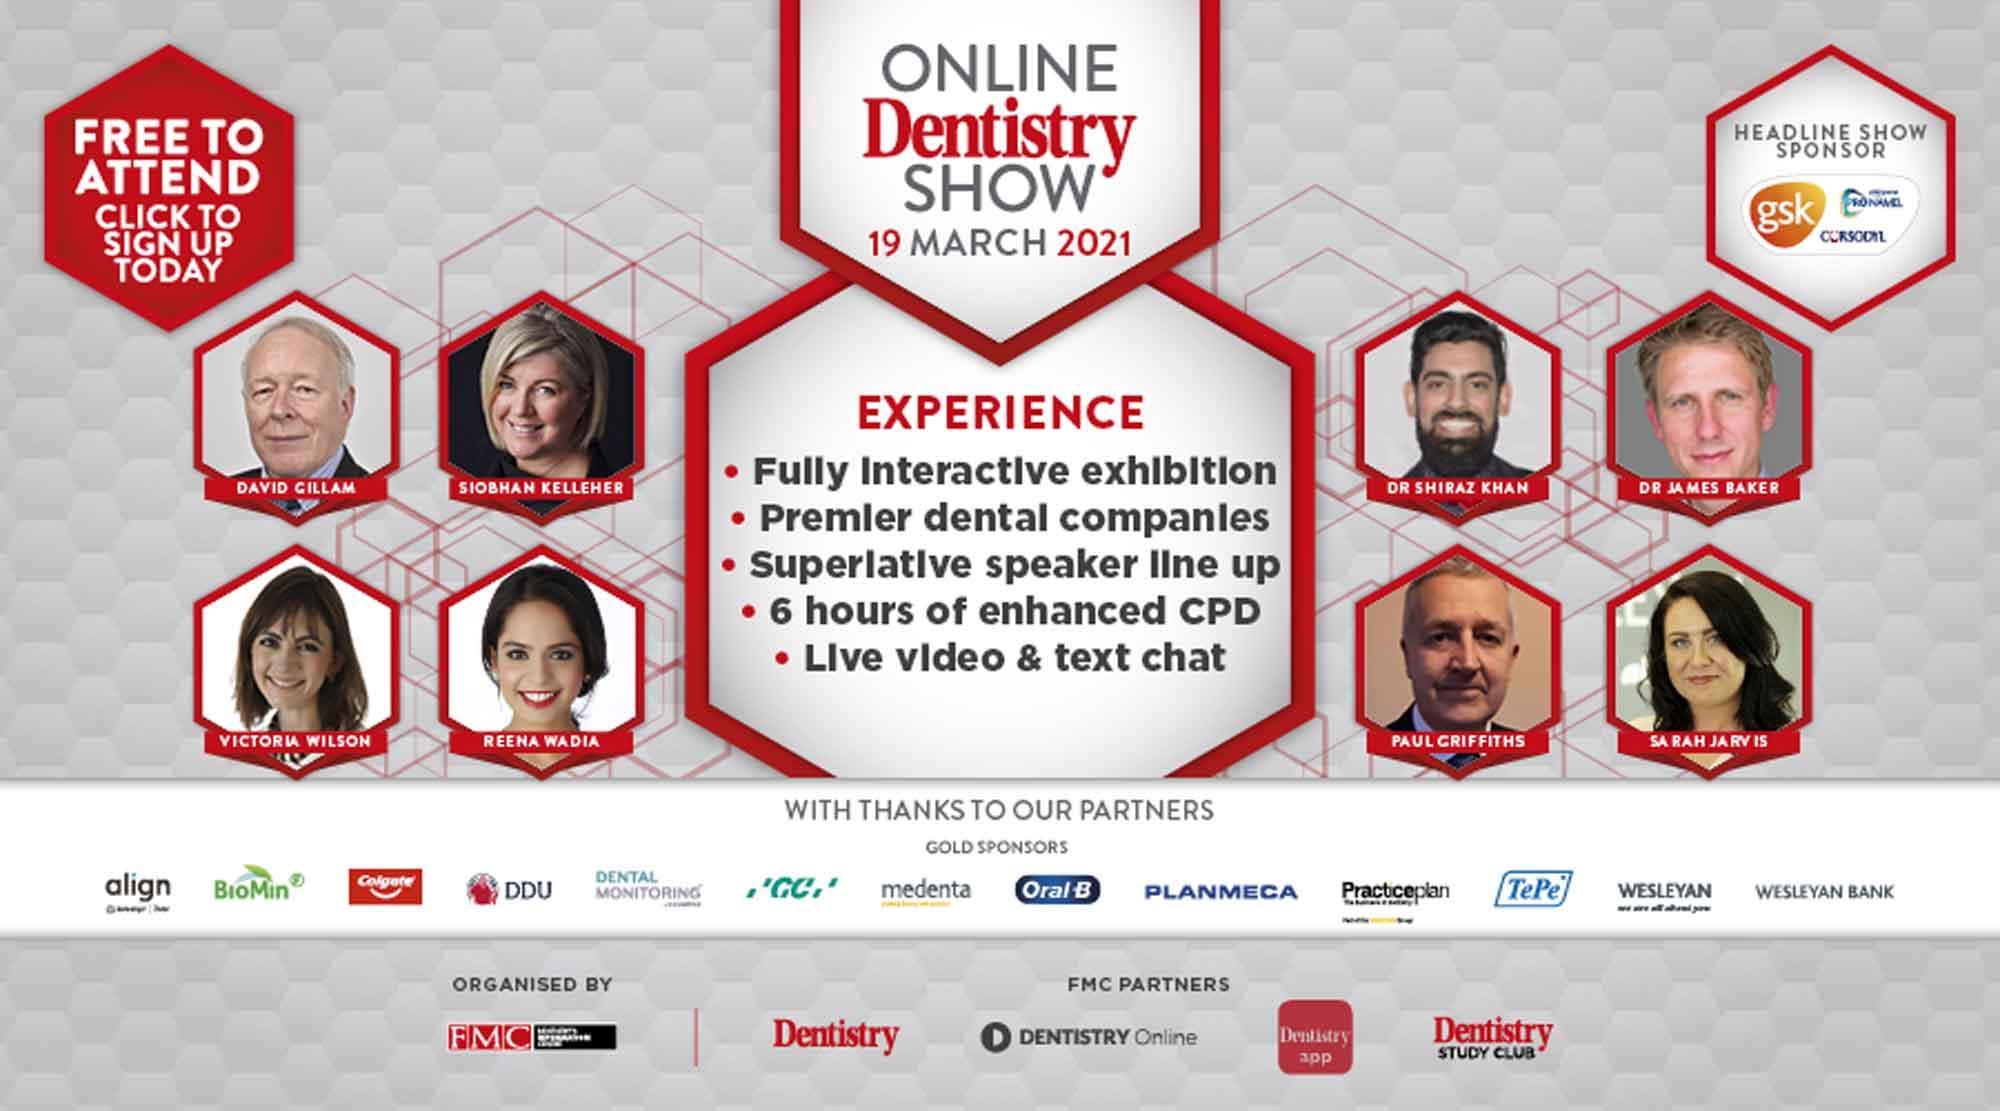 Online Dentistry Show 2021